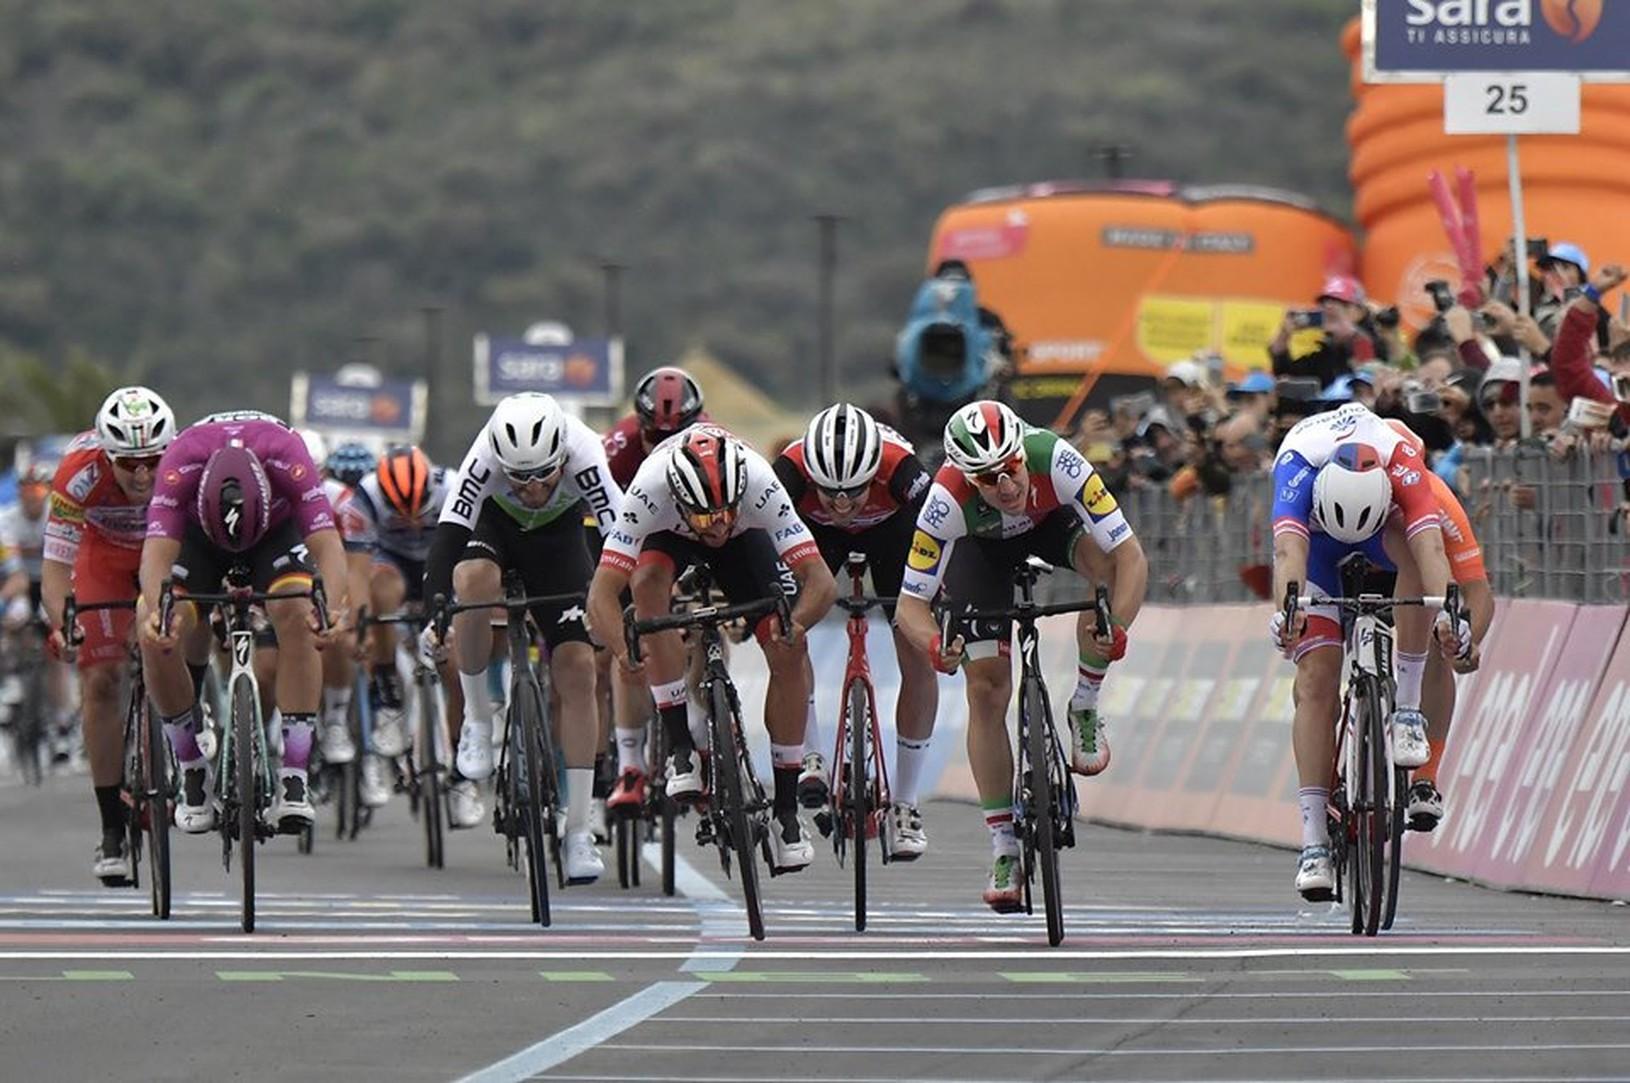 Šprintérsky záver 3. etapy